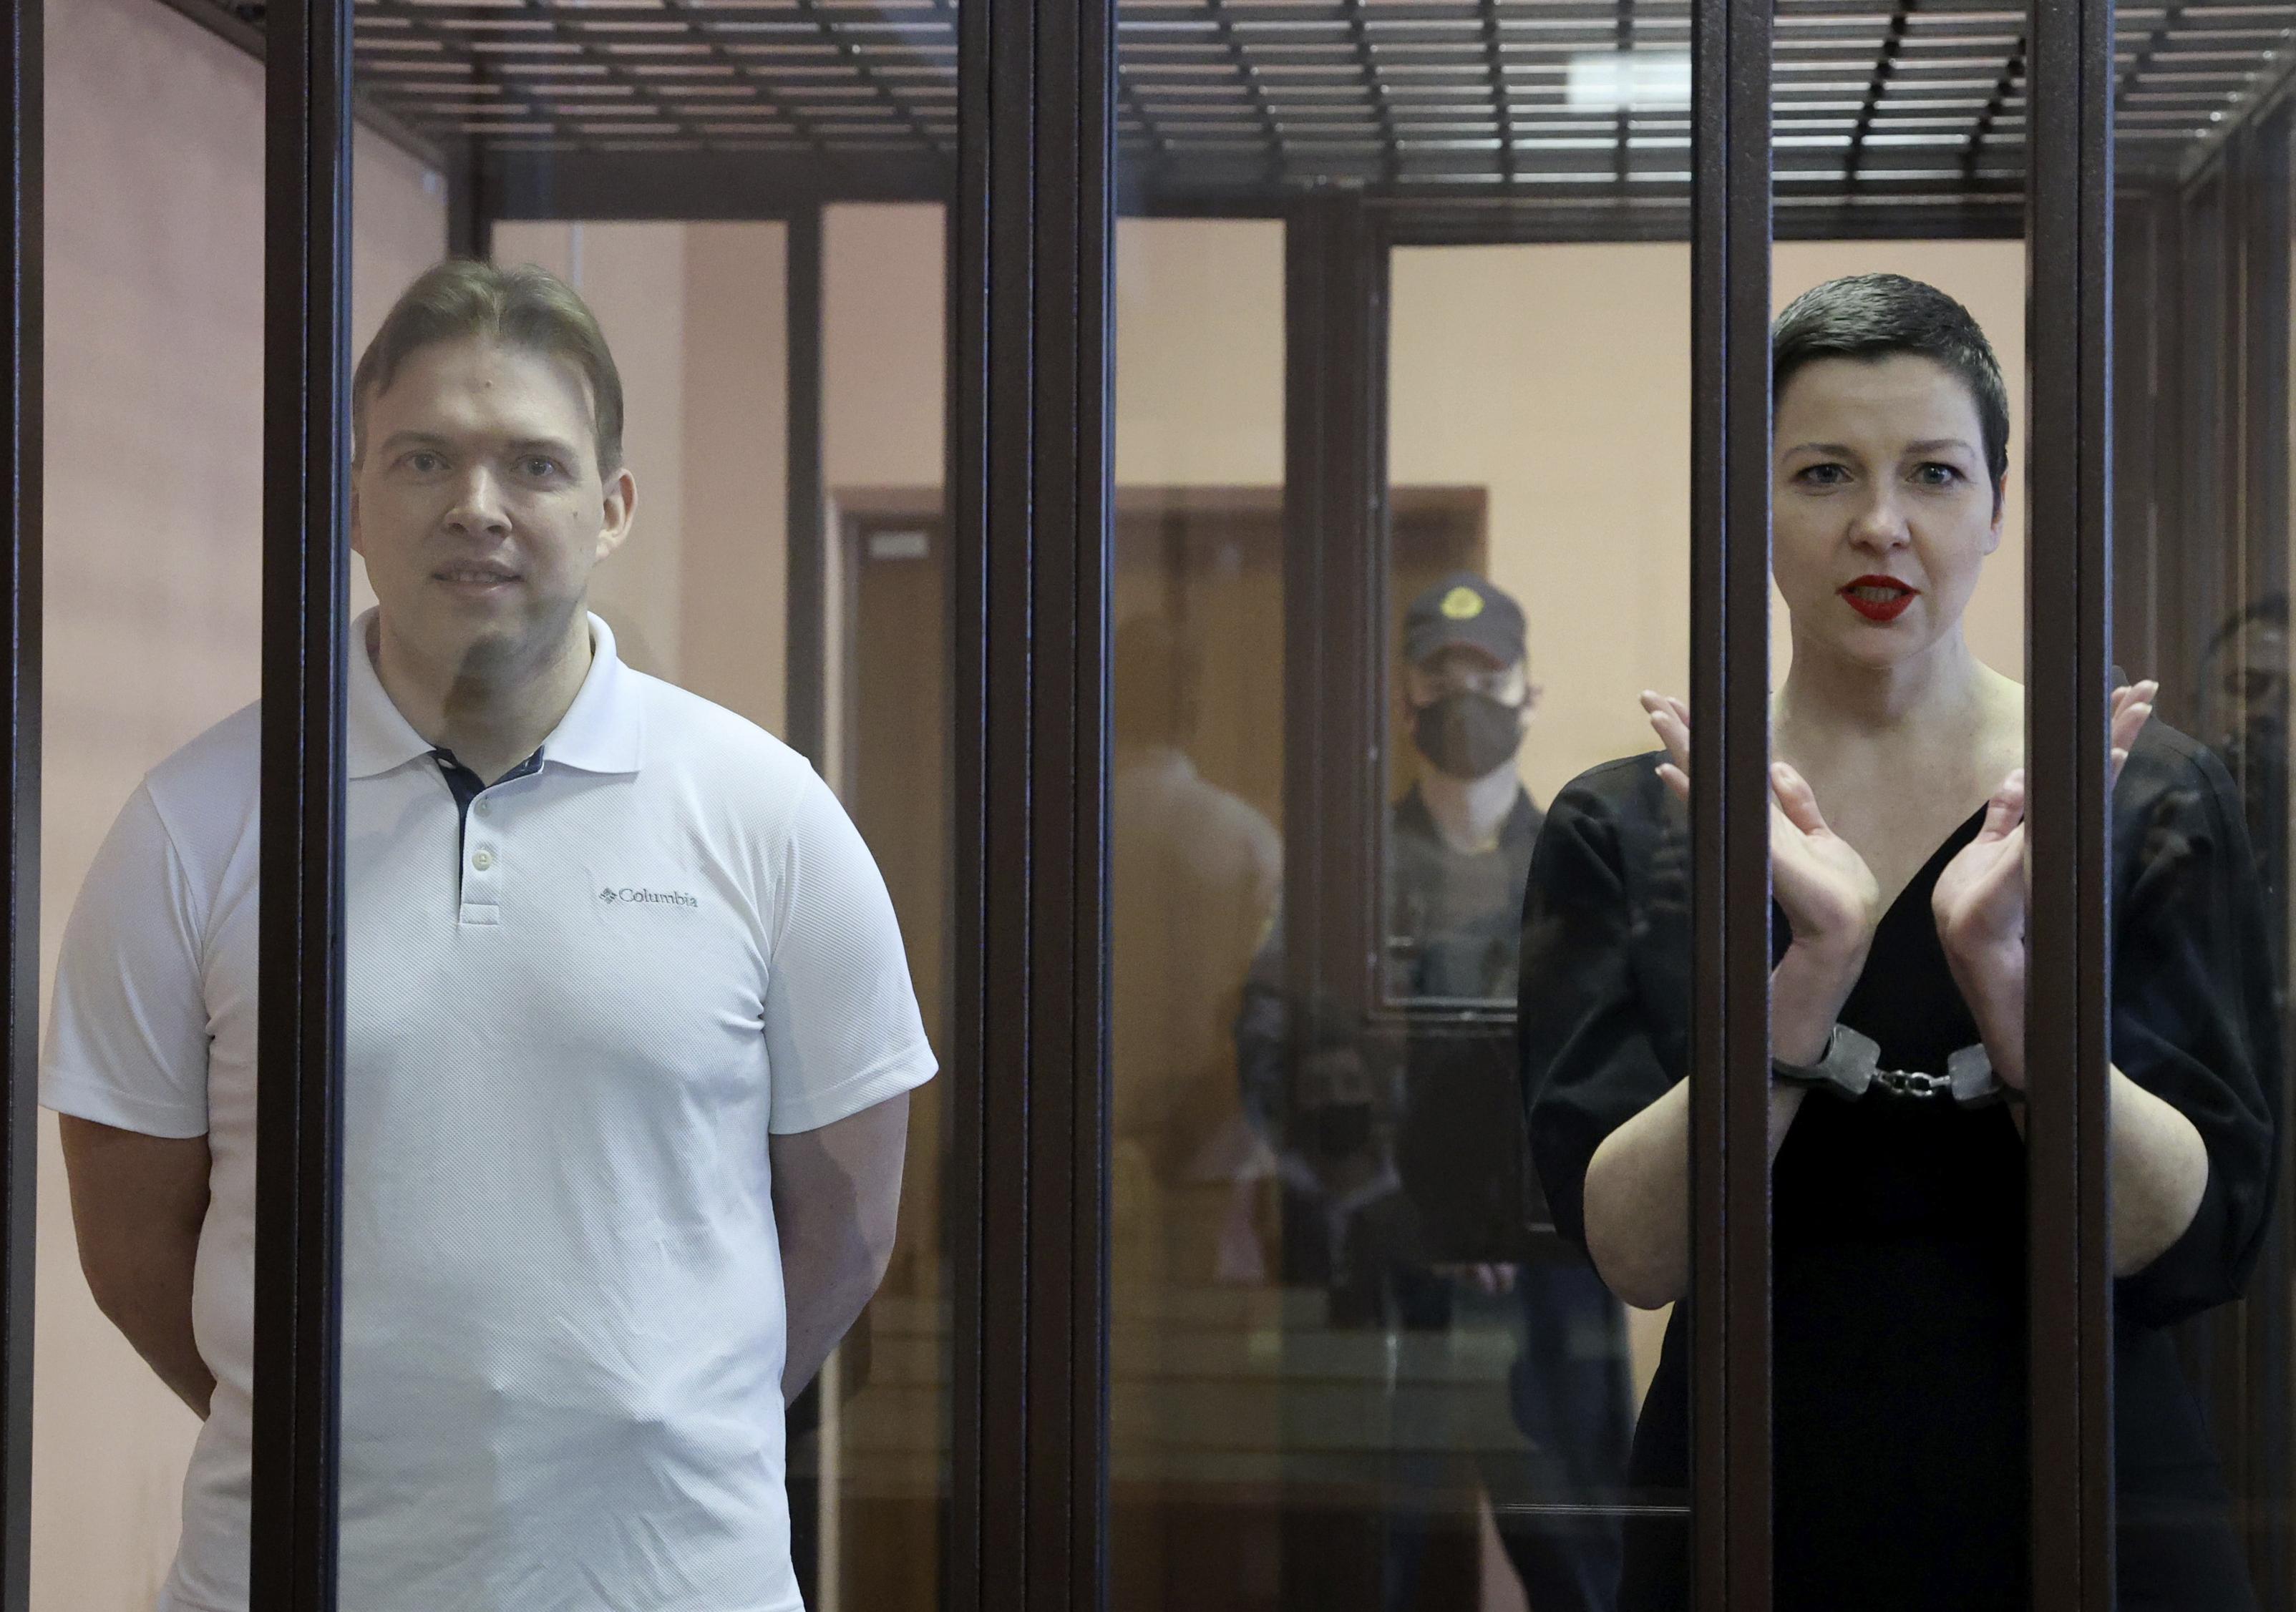 Belarus' opposition activists Maria Kolesnikova, right, and Maxim Znak attend a court hearing in Minsk, Belarus, Monday, Sept. 6, 2021.